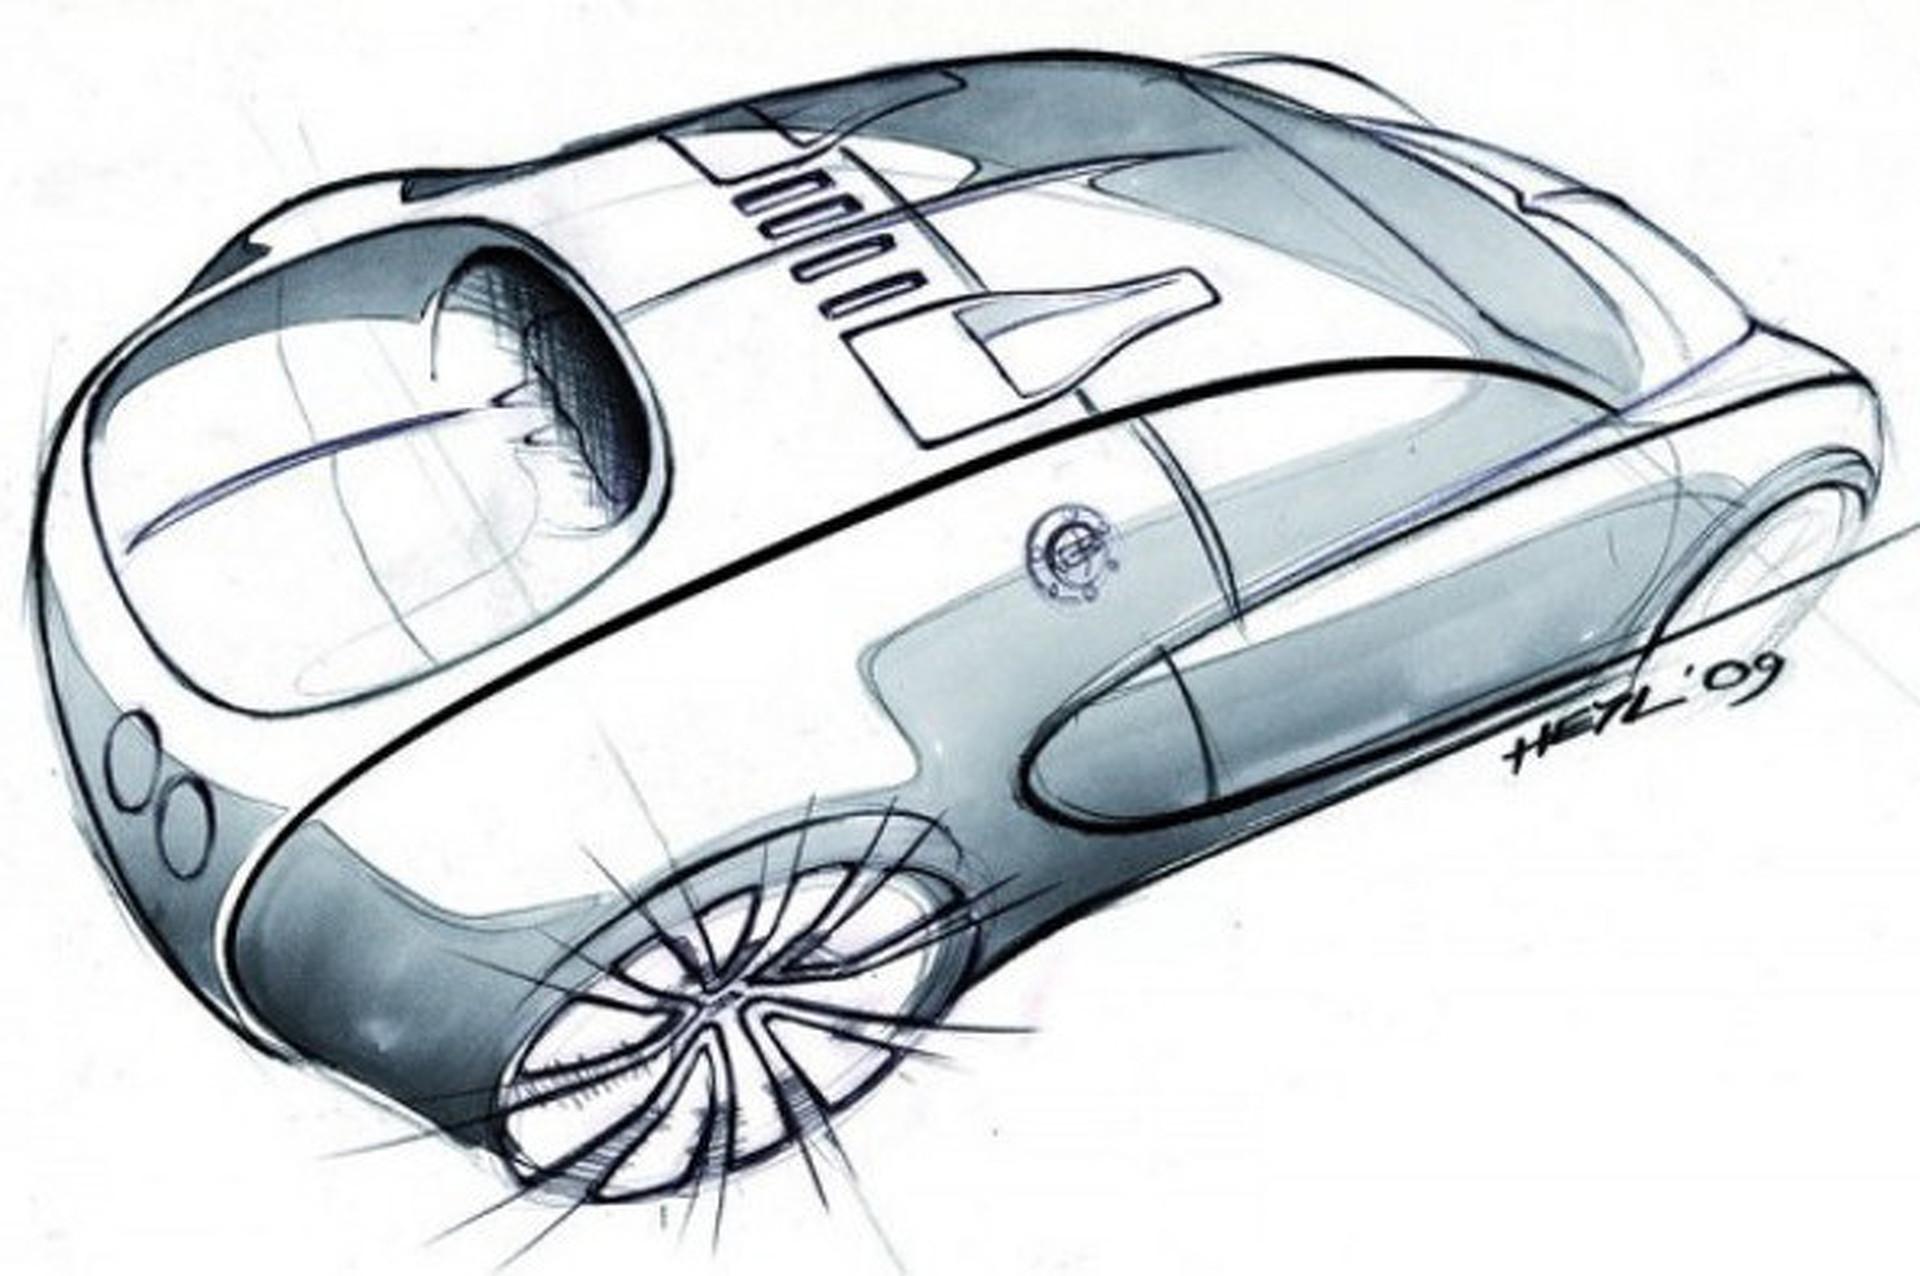 Bugatti Planning Limited-Run Super-Veyron